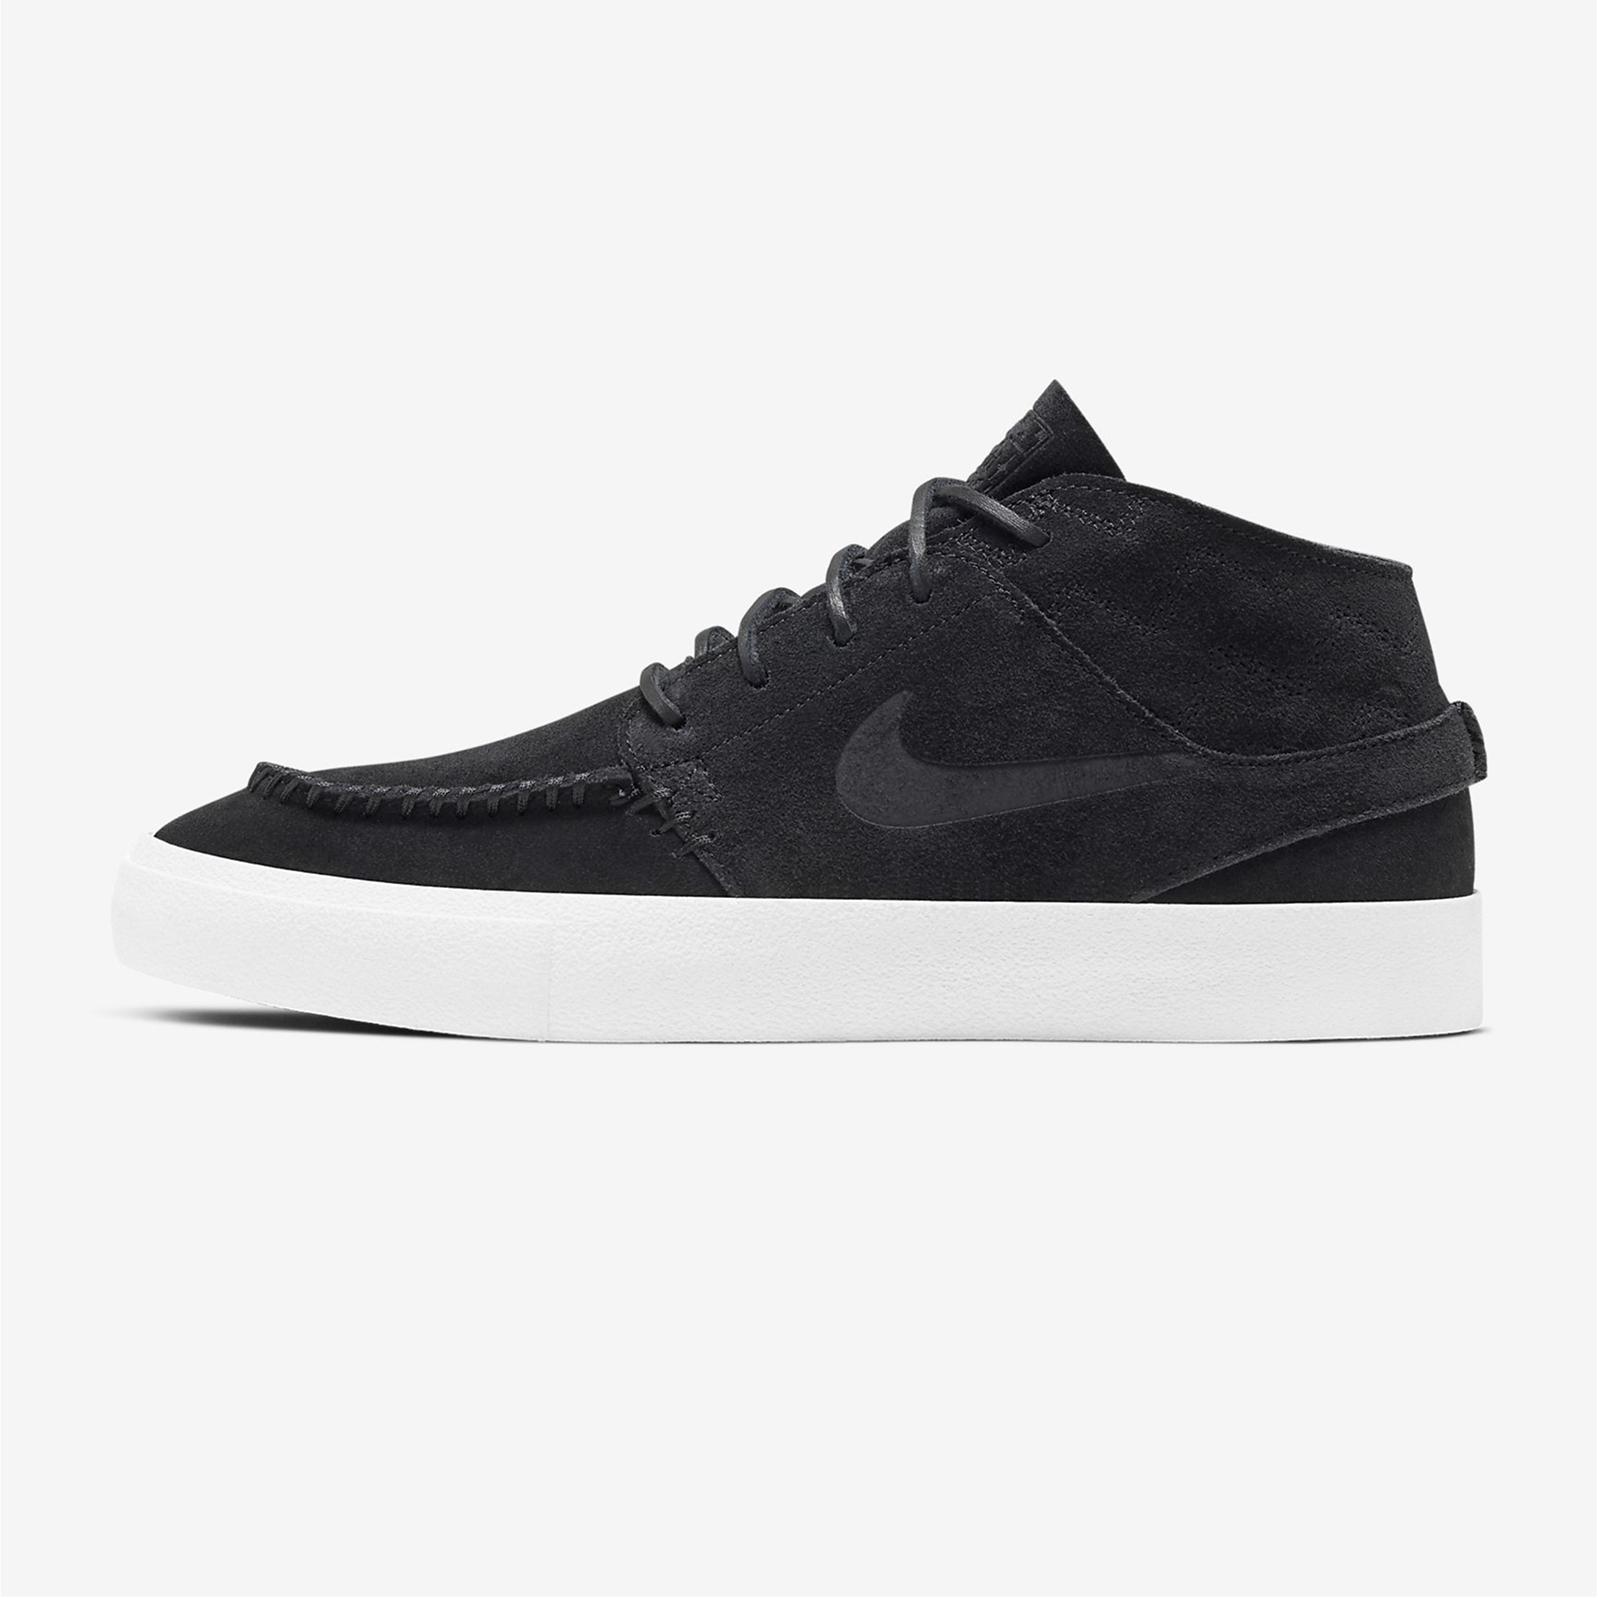 Nike 耐克 Zoom Janoski Mid RM Crafted 男女滑板运动鞋